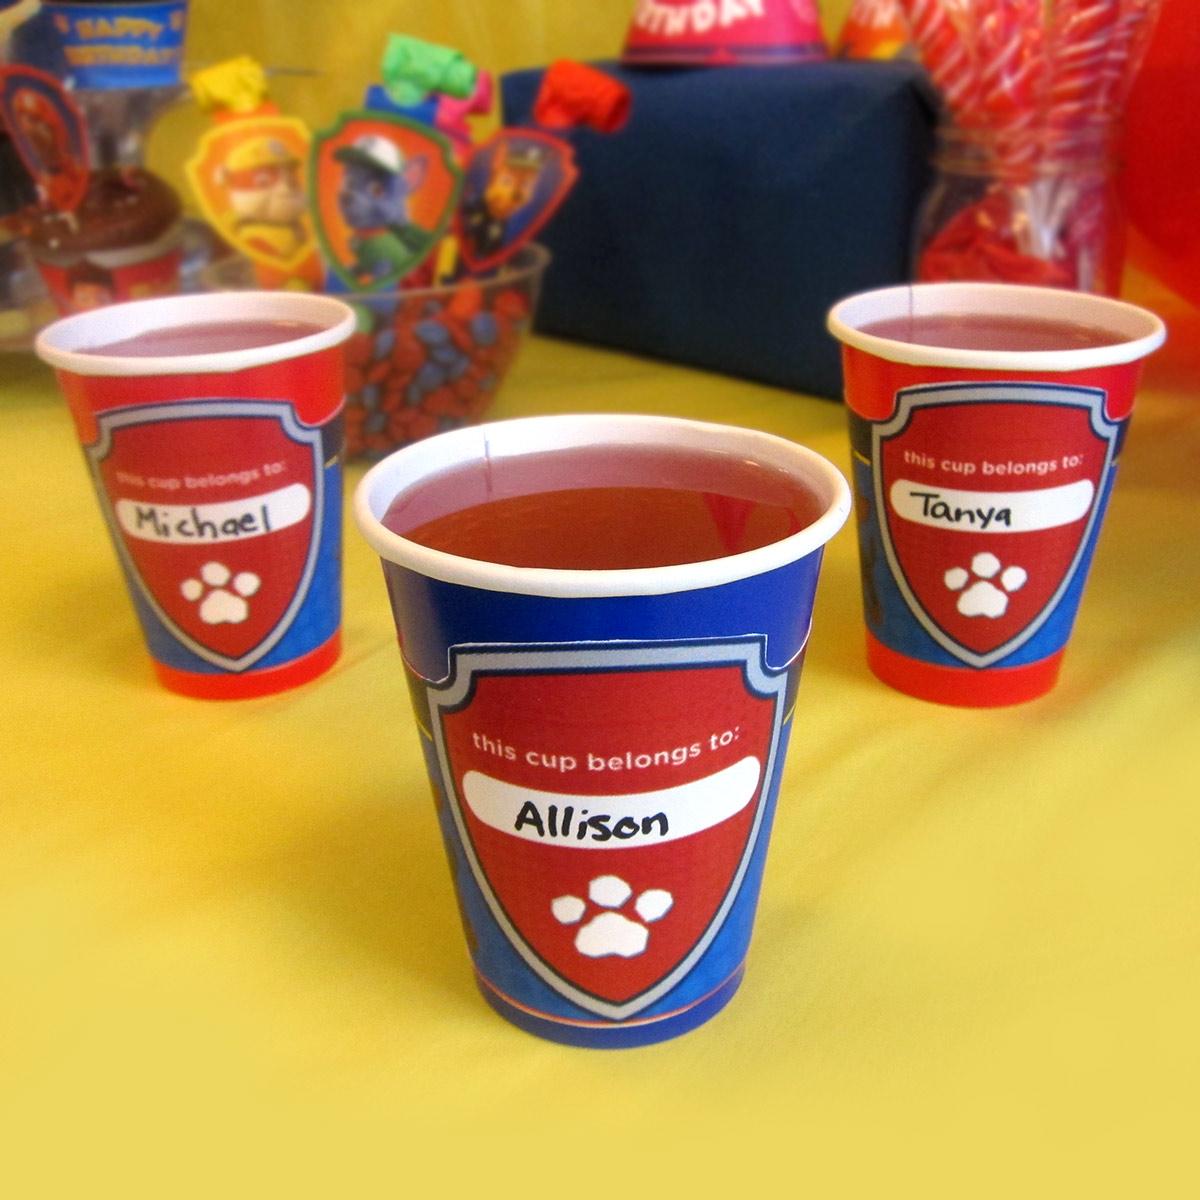 pawPatrol-cupWrappers1x1